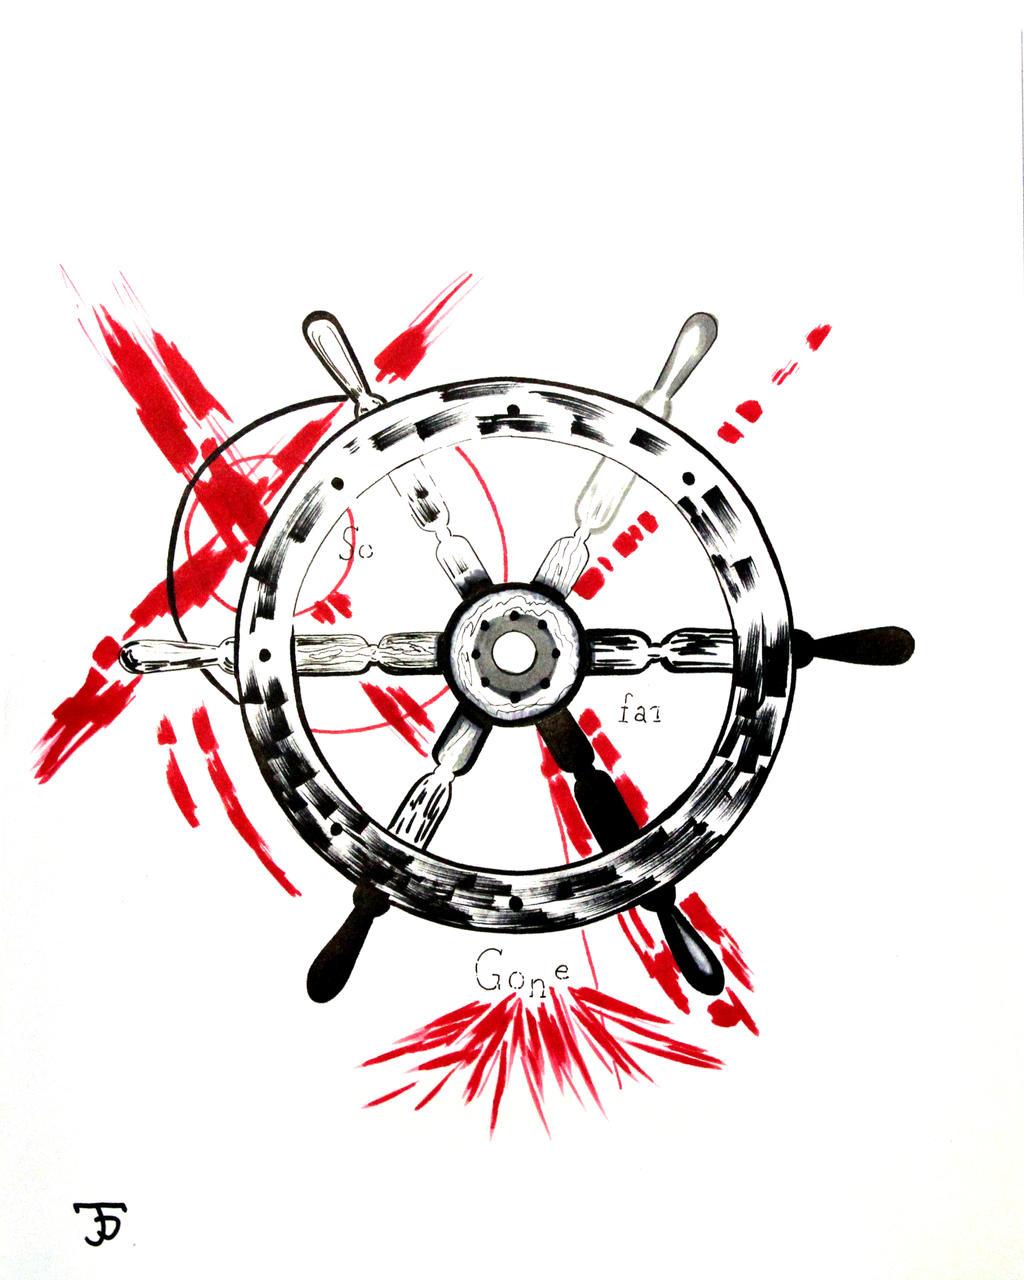 Trash Polka Skull By Mcrdesign On Deviantart: Trash Polka Ship Wheel By Jdelmontetattoos On DeviantArt